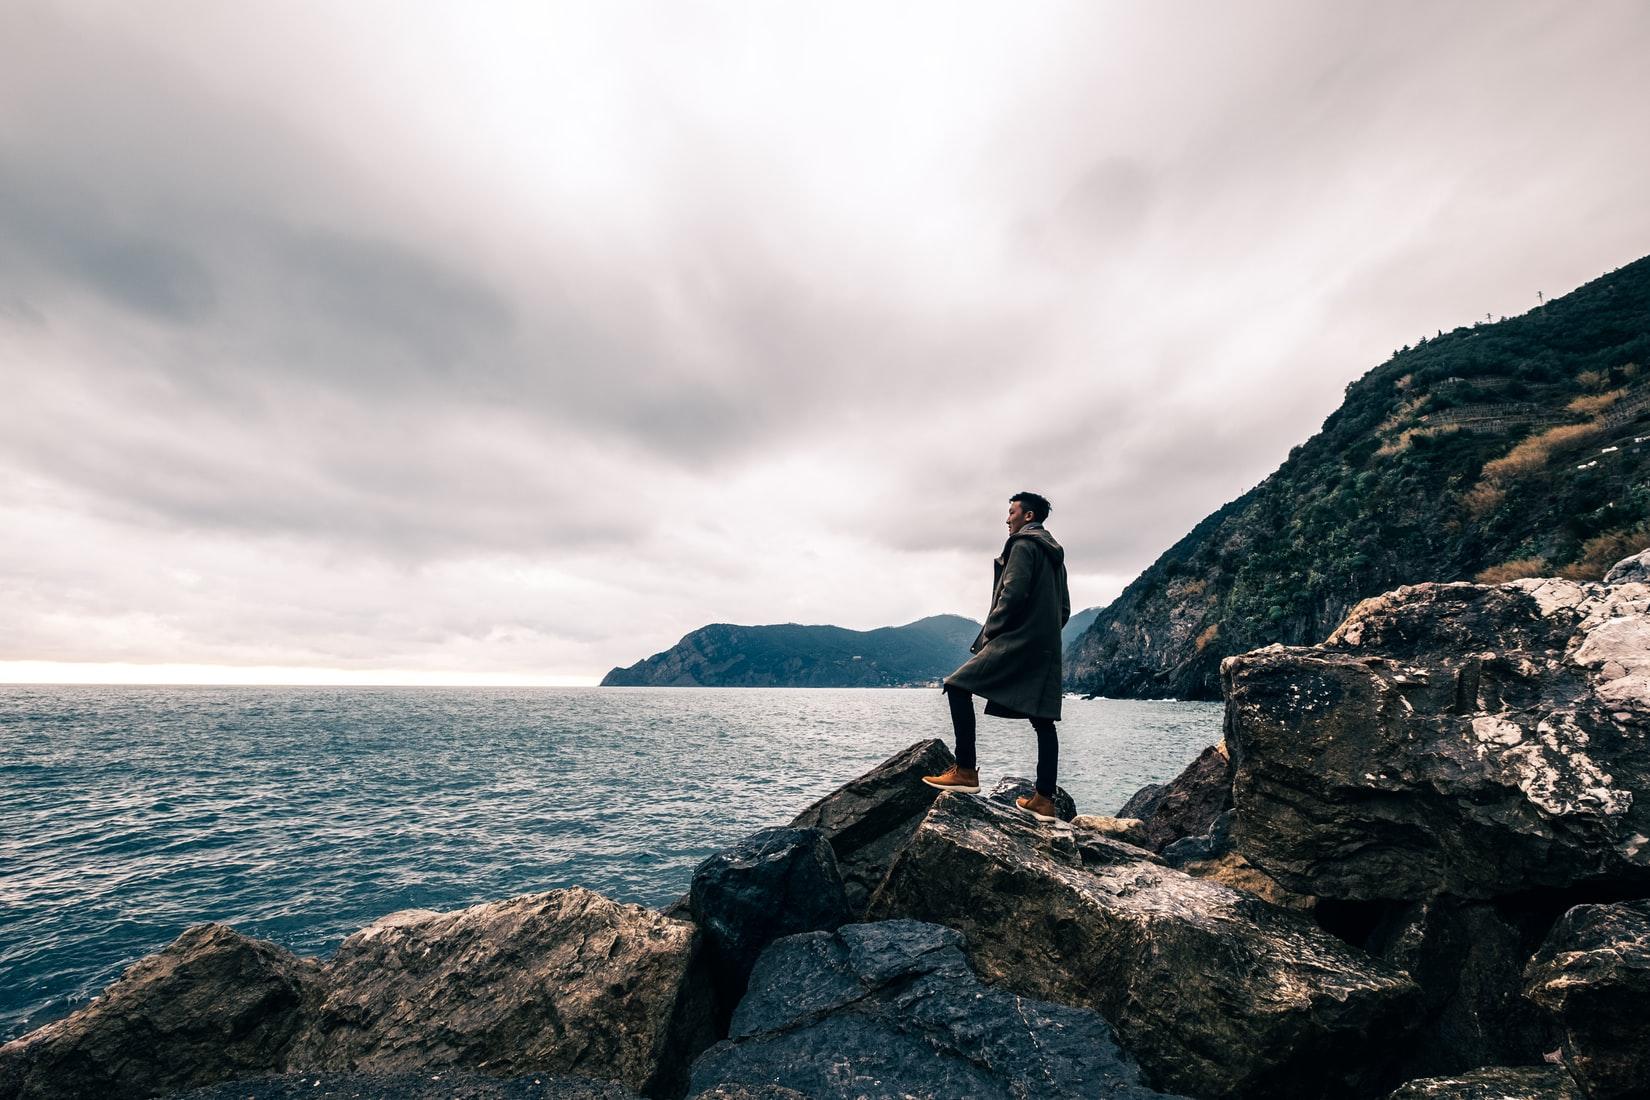 person-standing-landscape-scenery